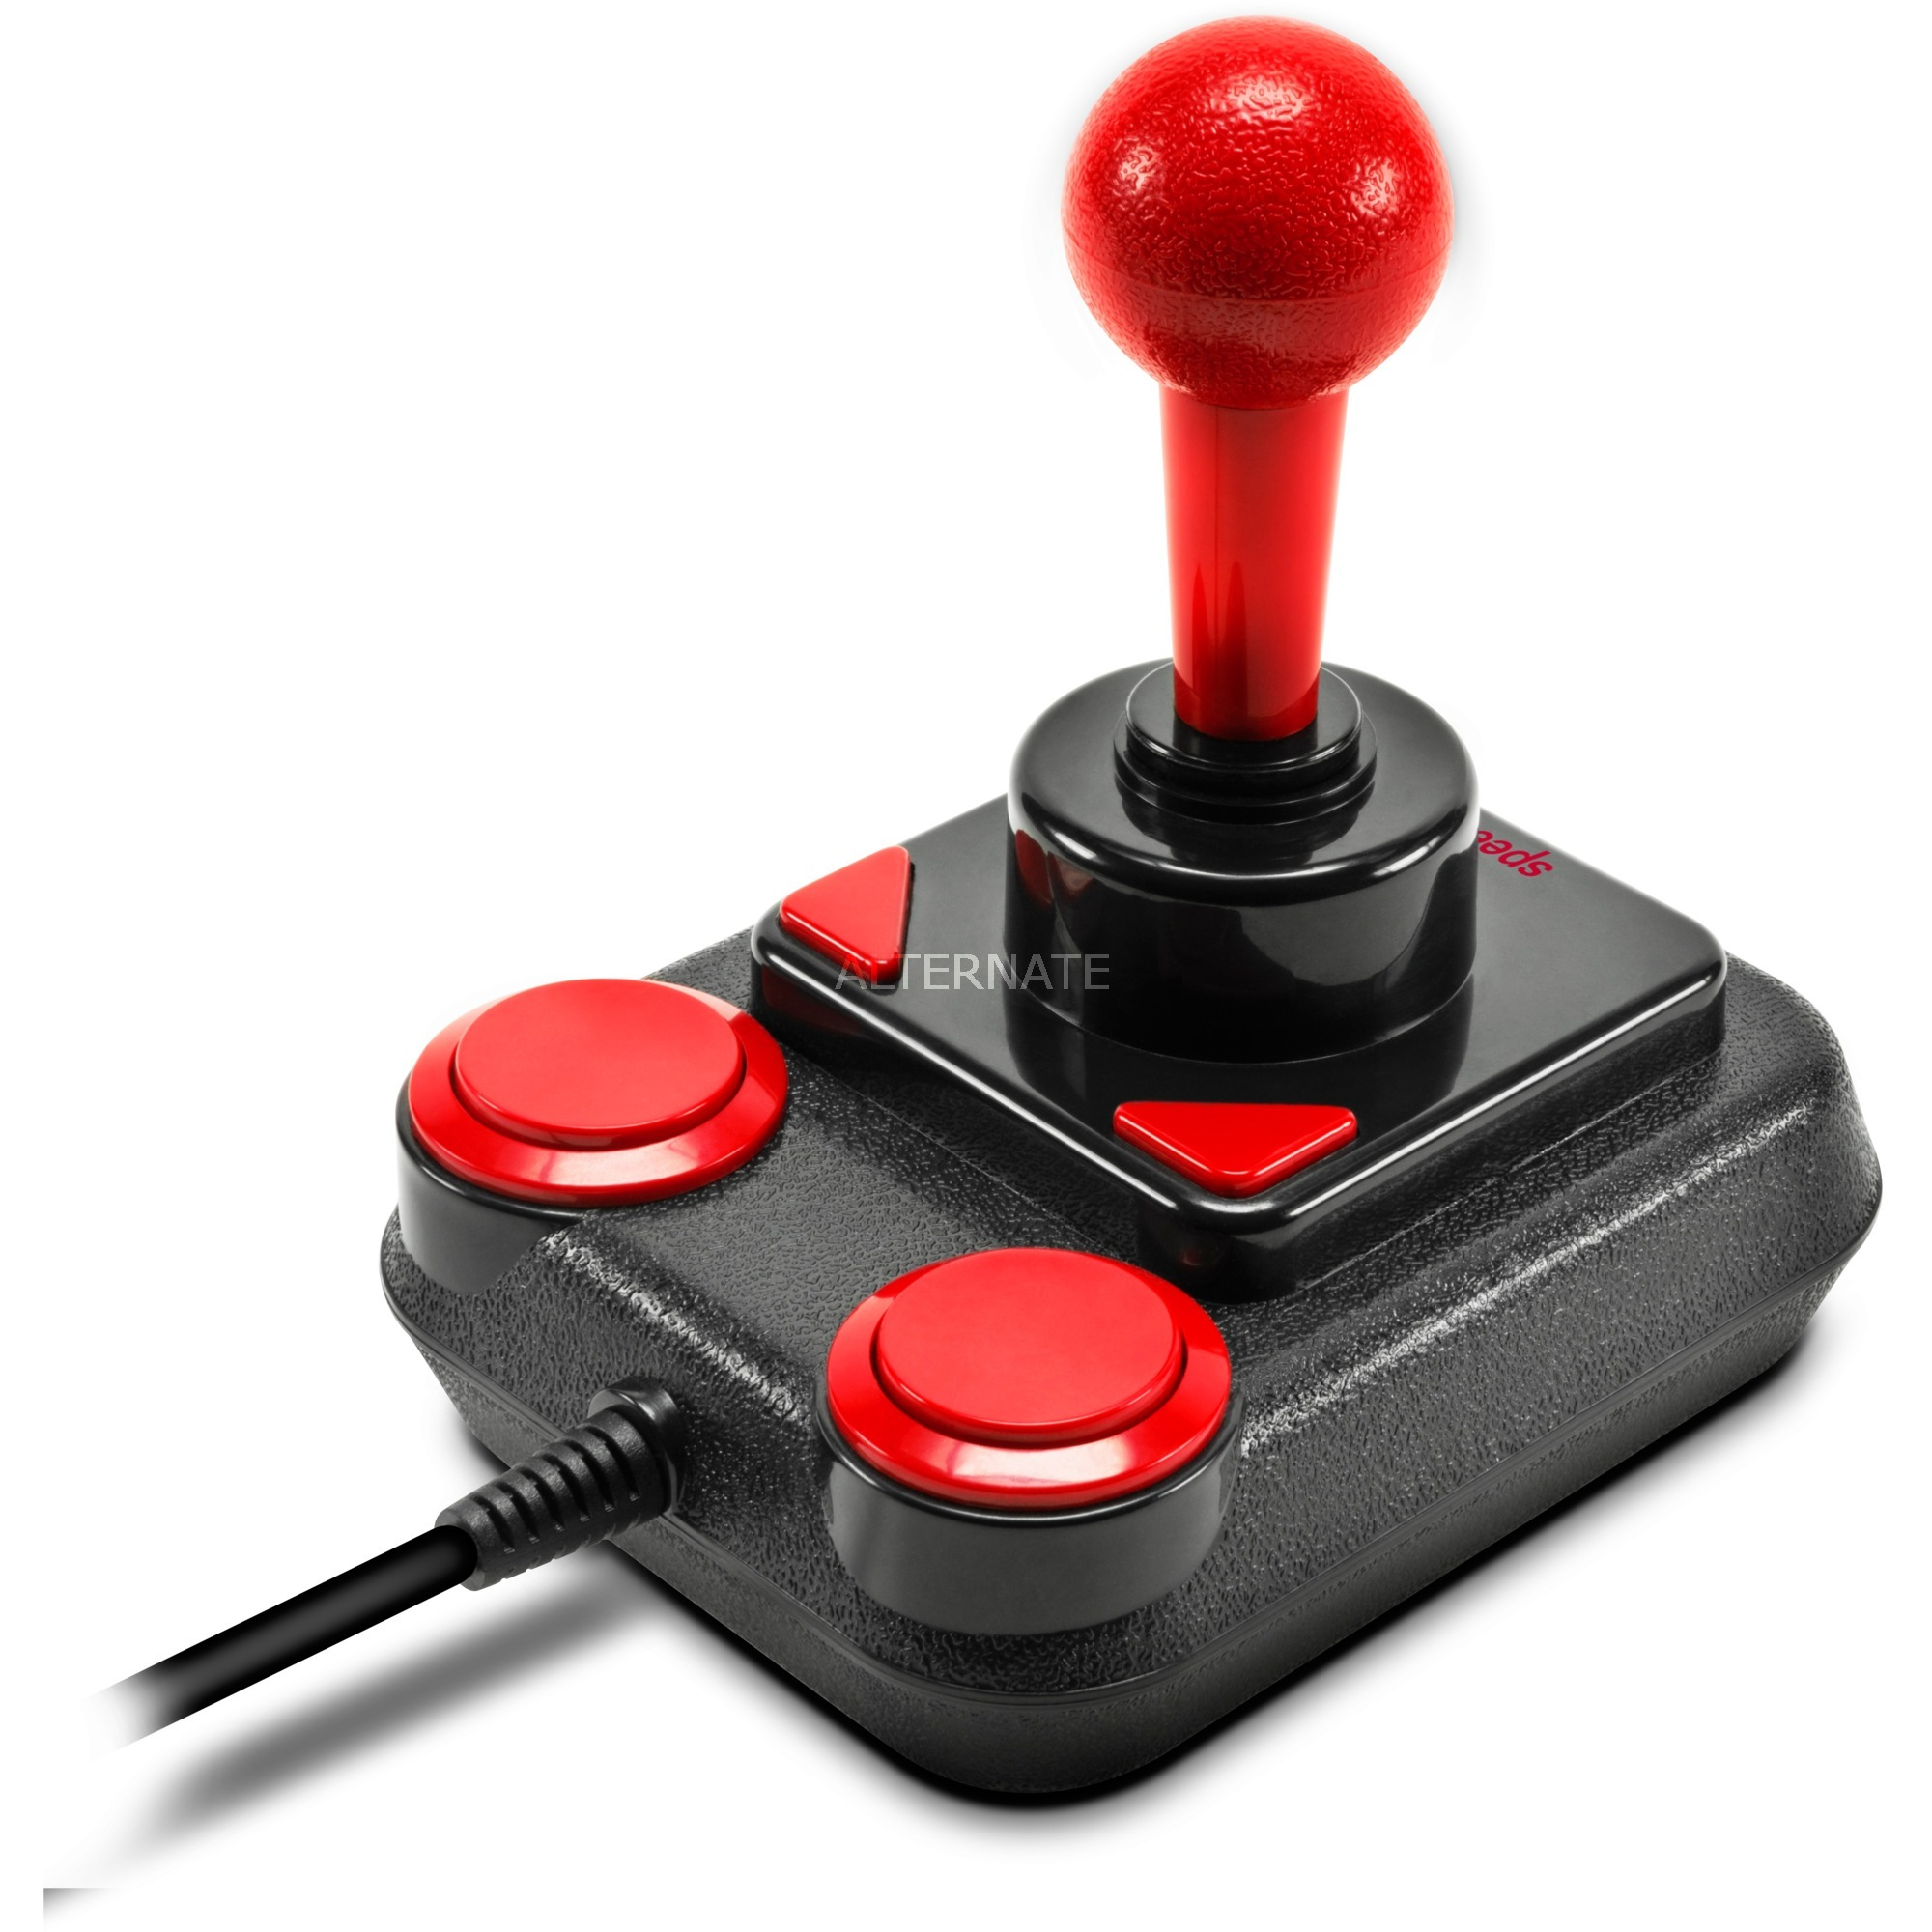 Competition Pro Extra Palanca de mando Android,PC Analógico USB 1.1 Negro, Rojo